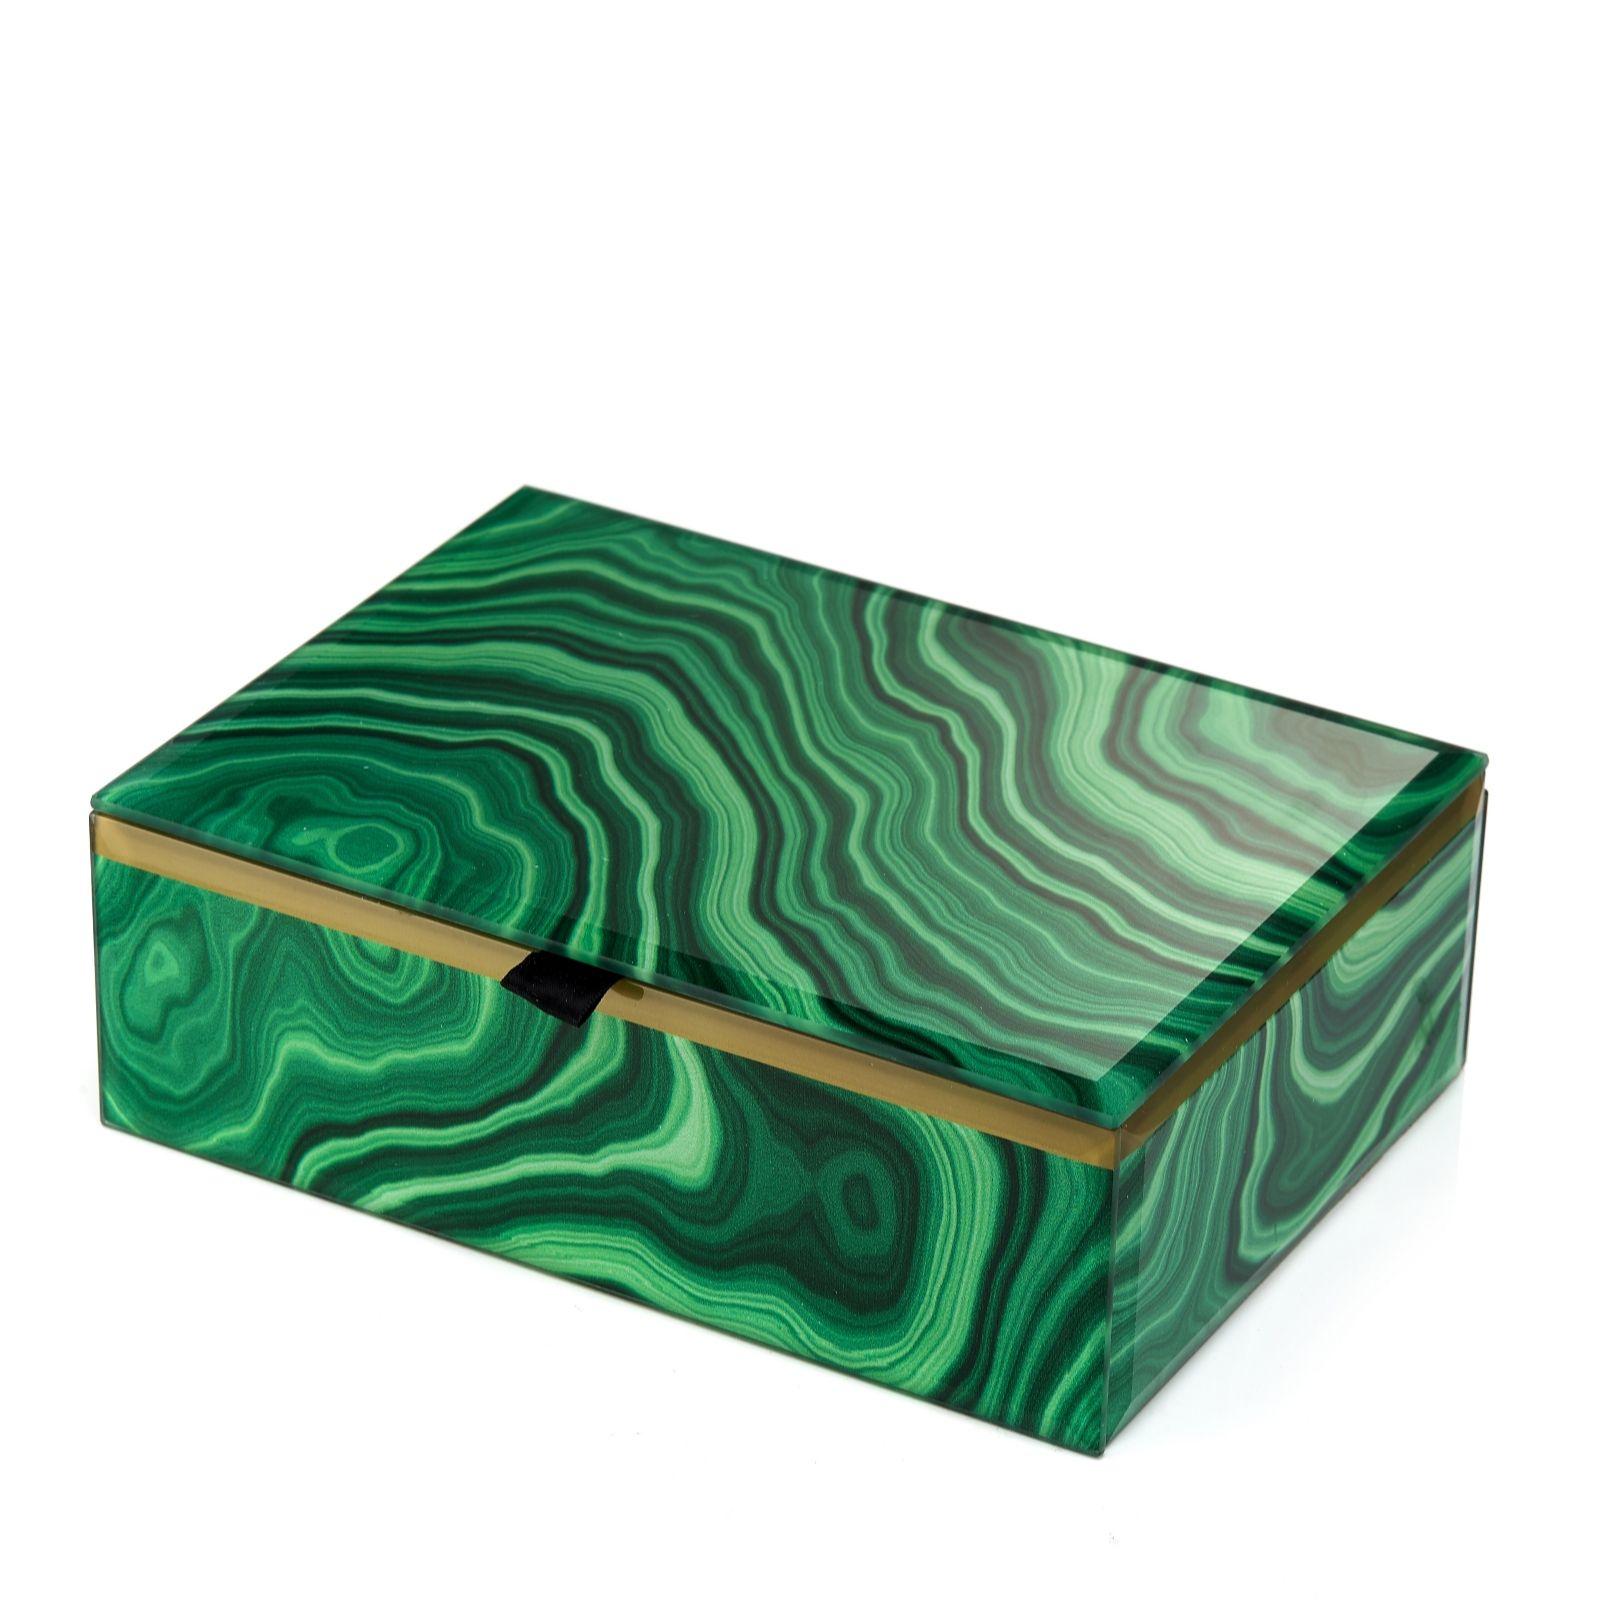 Lola Rose Jewellery Box Qvc Uk